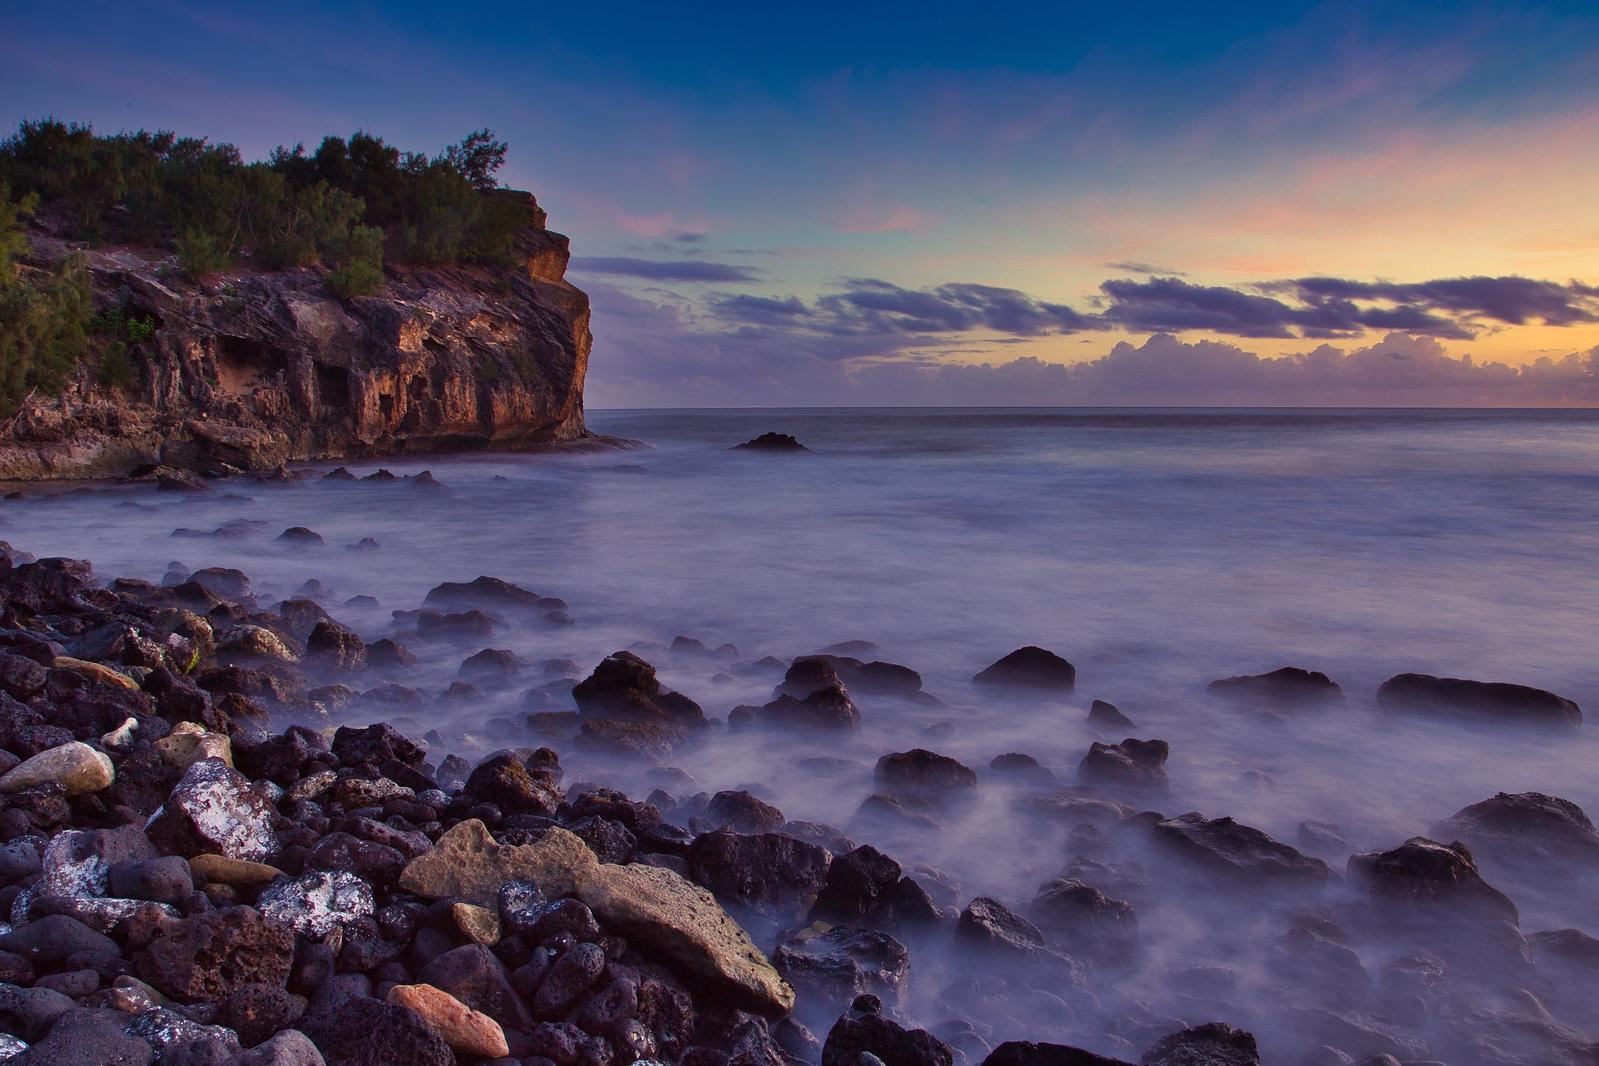 IMAGE: https://photos.smugmug.com/Hawaii/i-KwwHbTJ/0/ac4b5f8a/X3/Cliffs%20at%20Shipwreck%201-X3.jpg